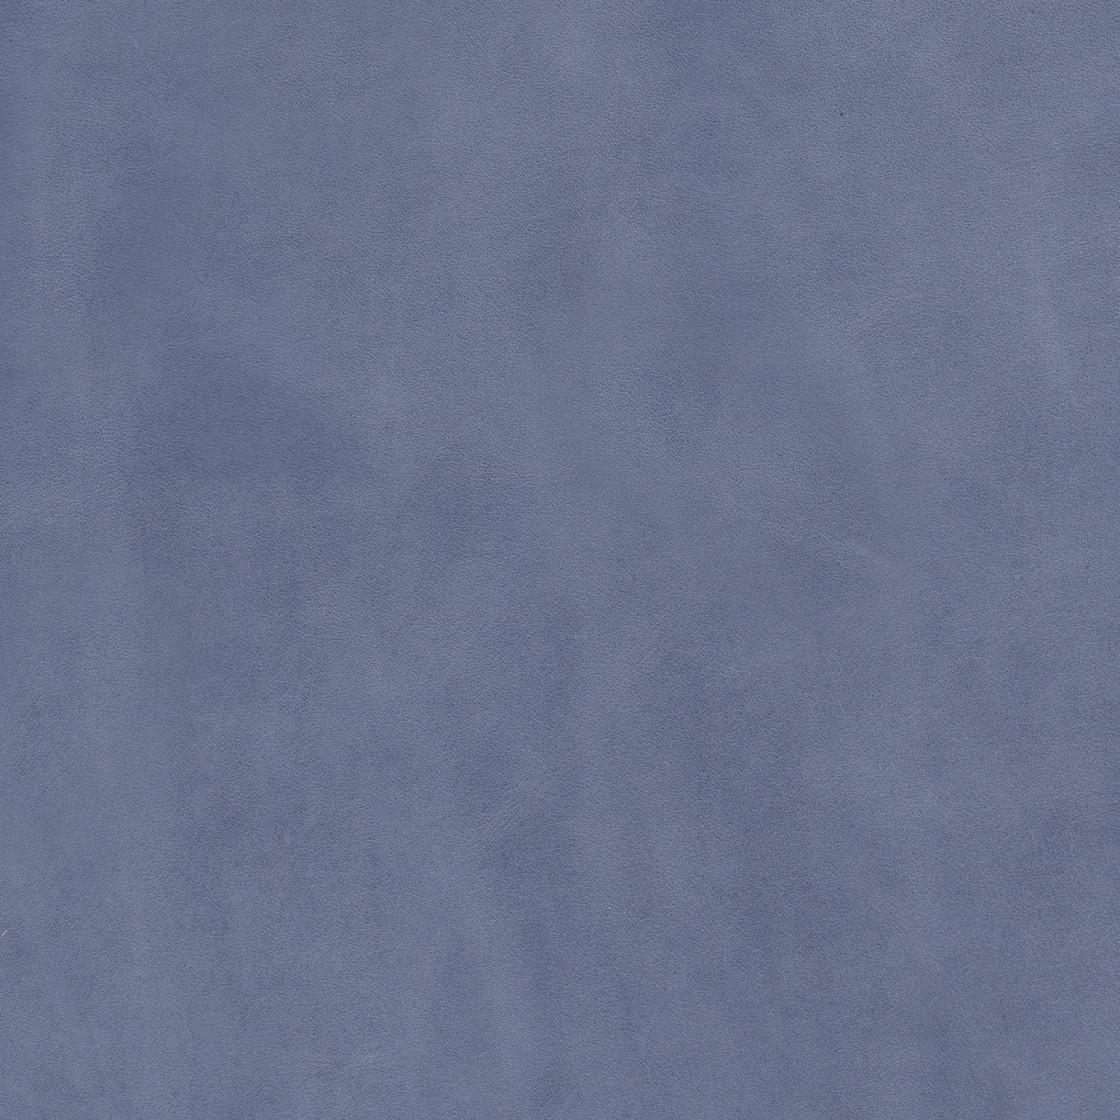 Cirrus 12/14 - Pleine fleur, 11 coloris